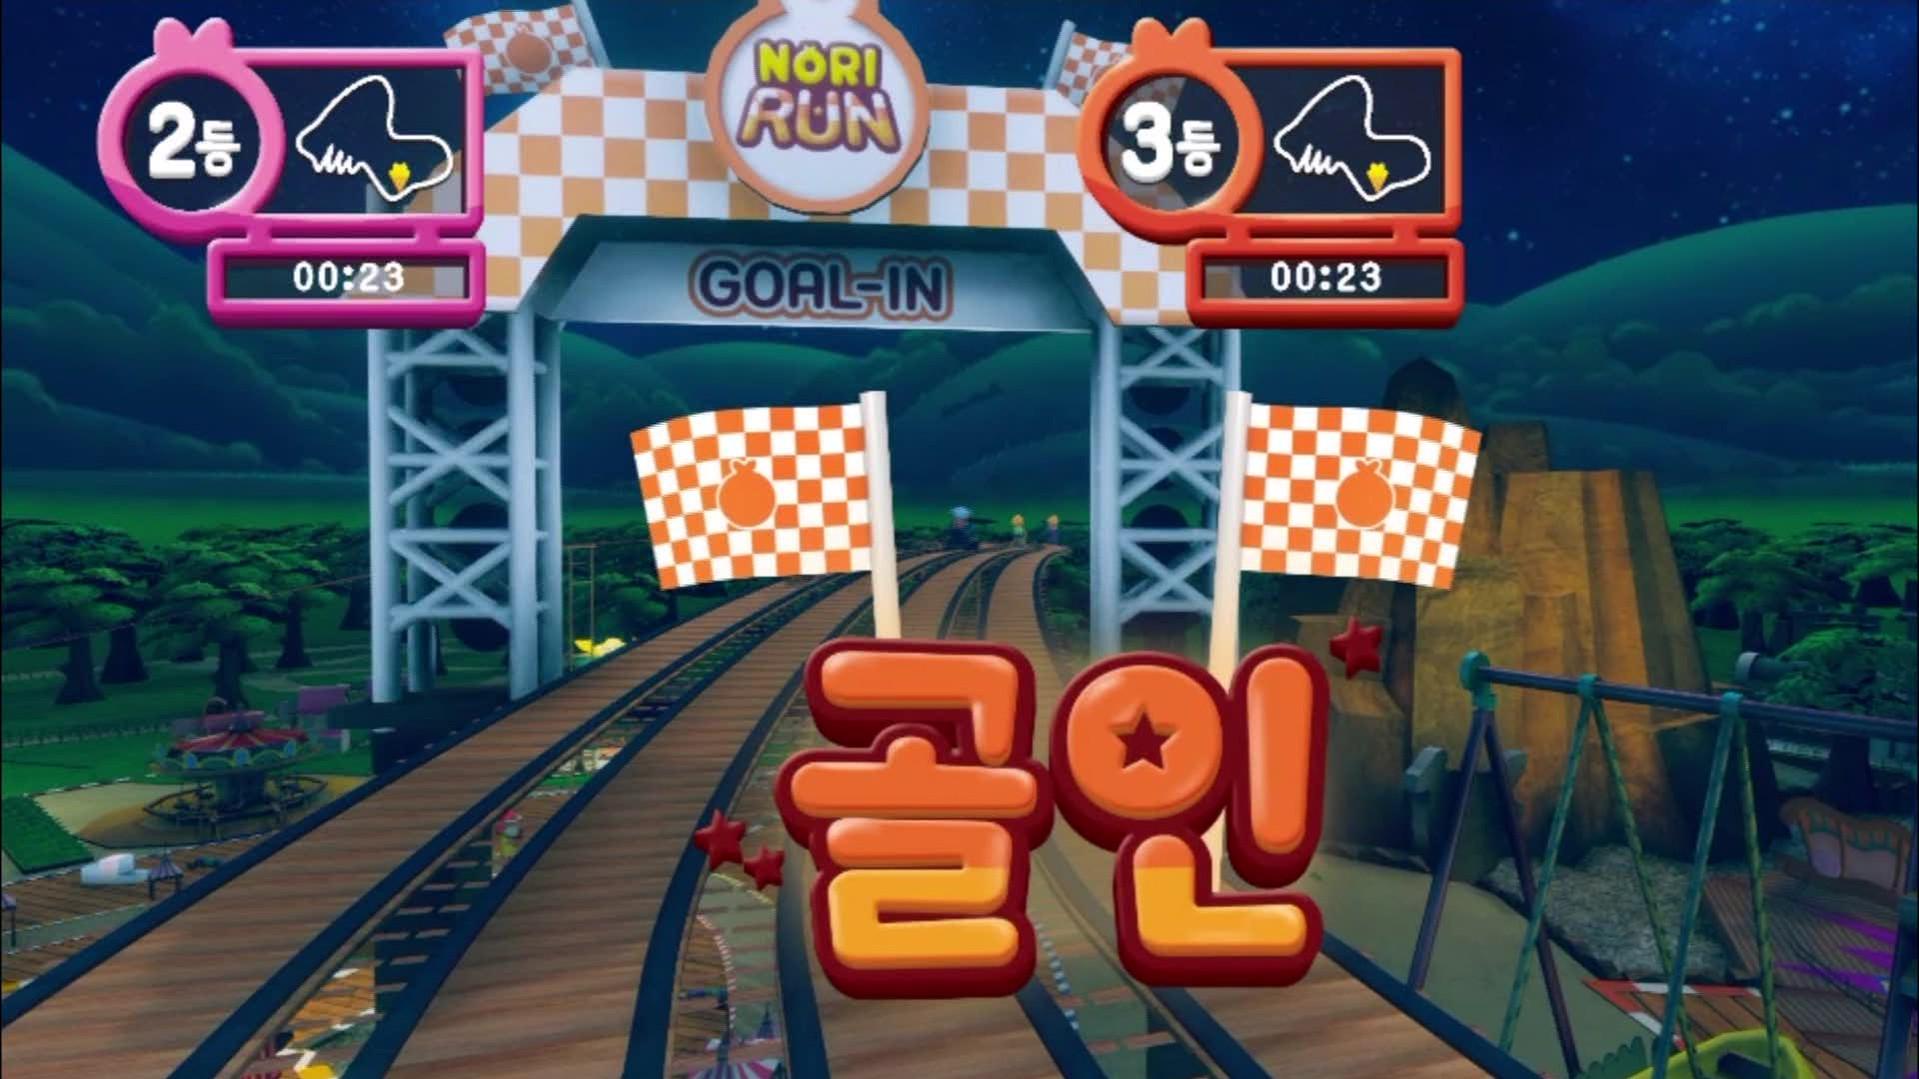 Interactive Multi-player Run Challenge Games